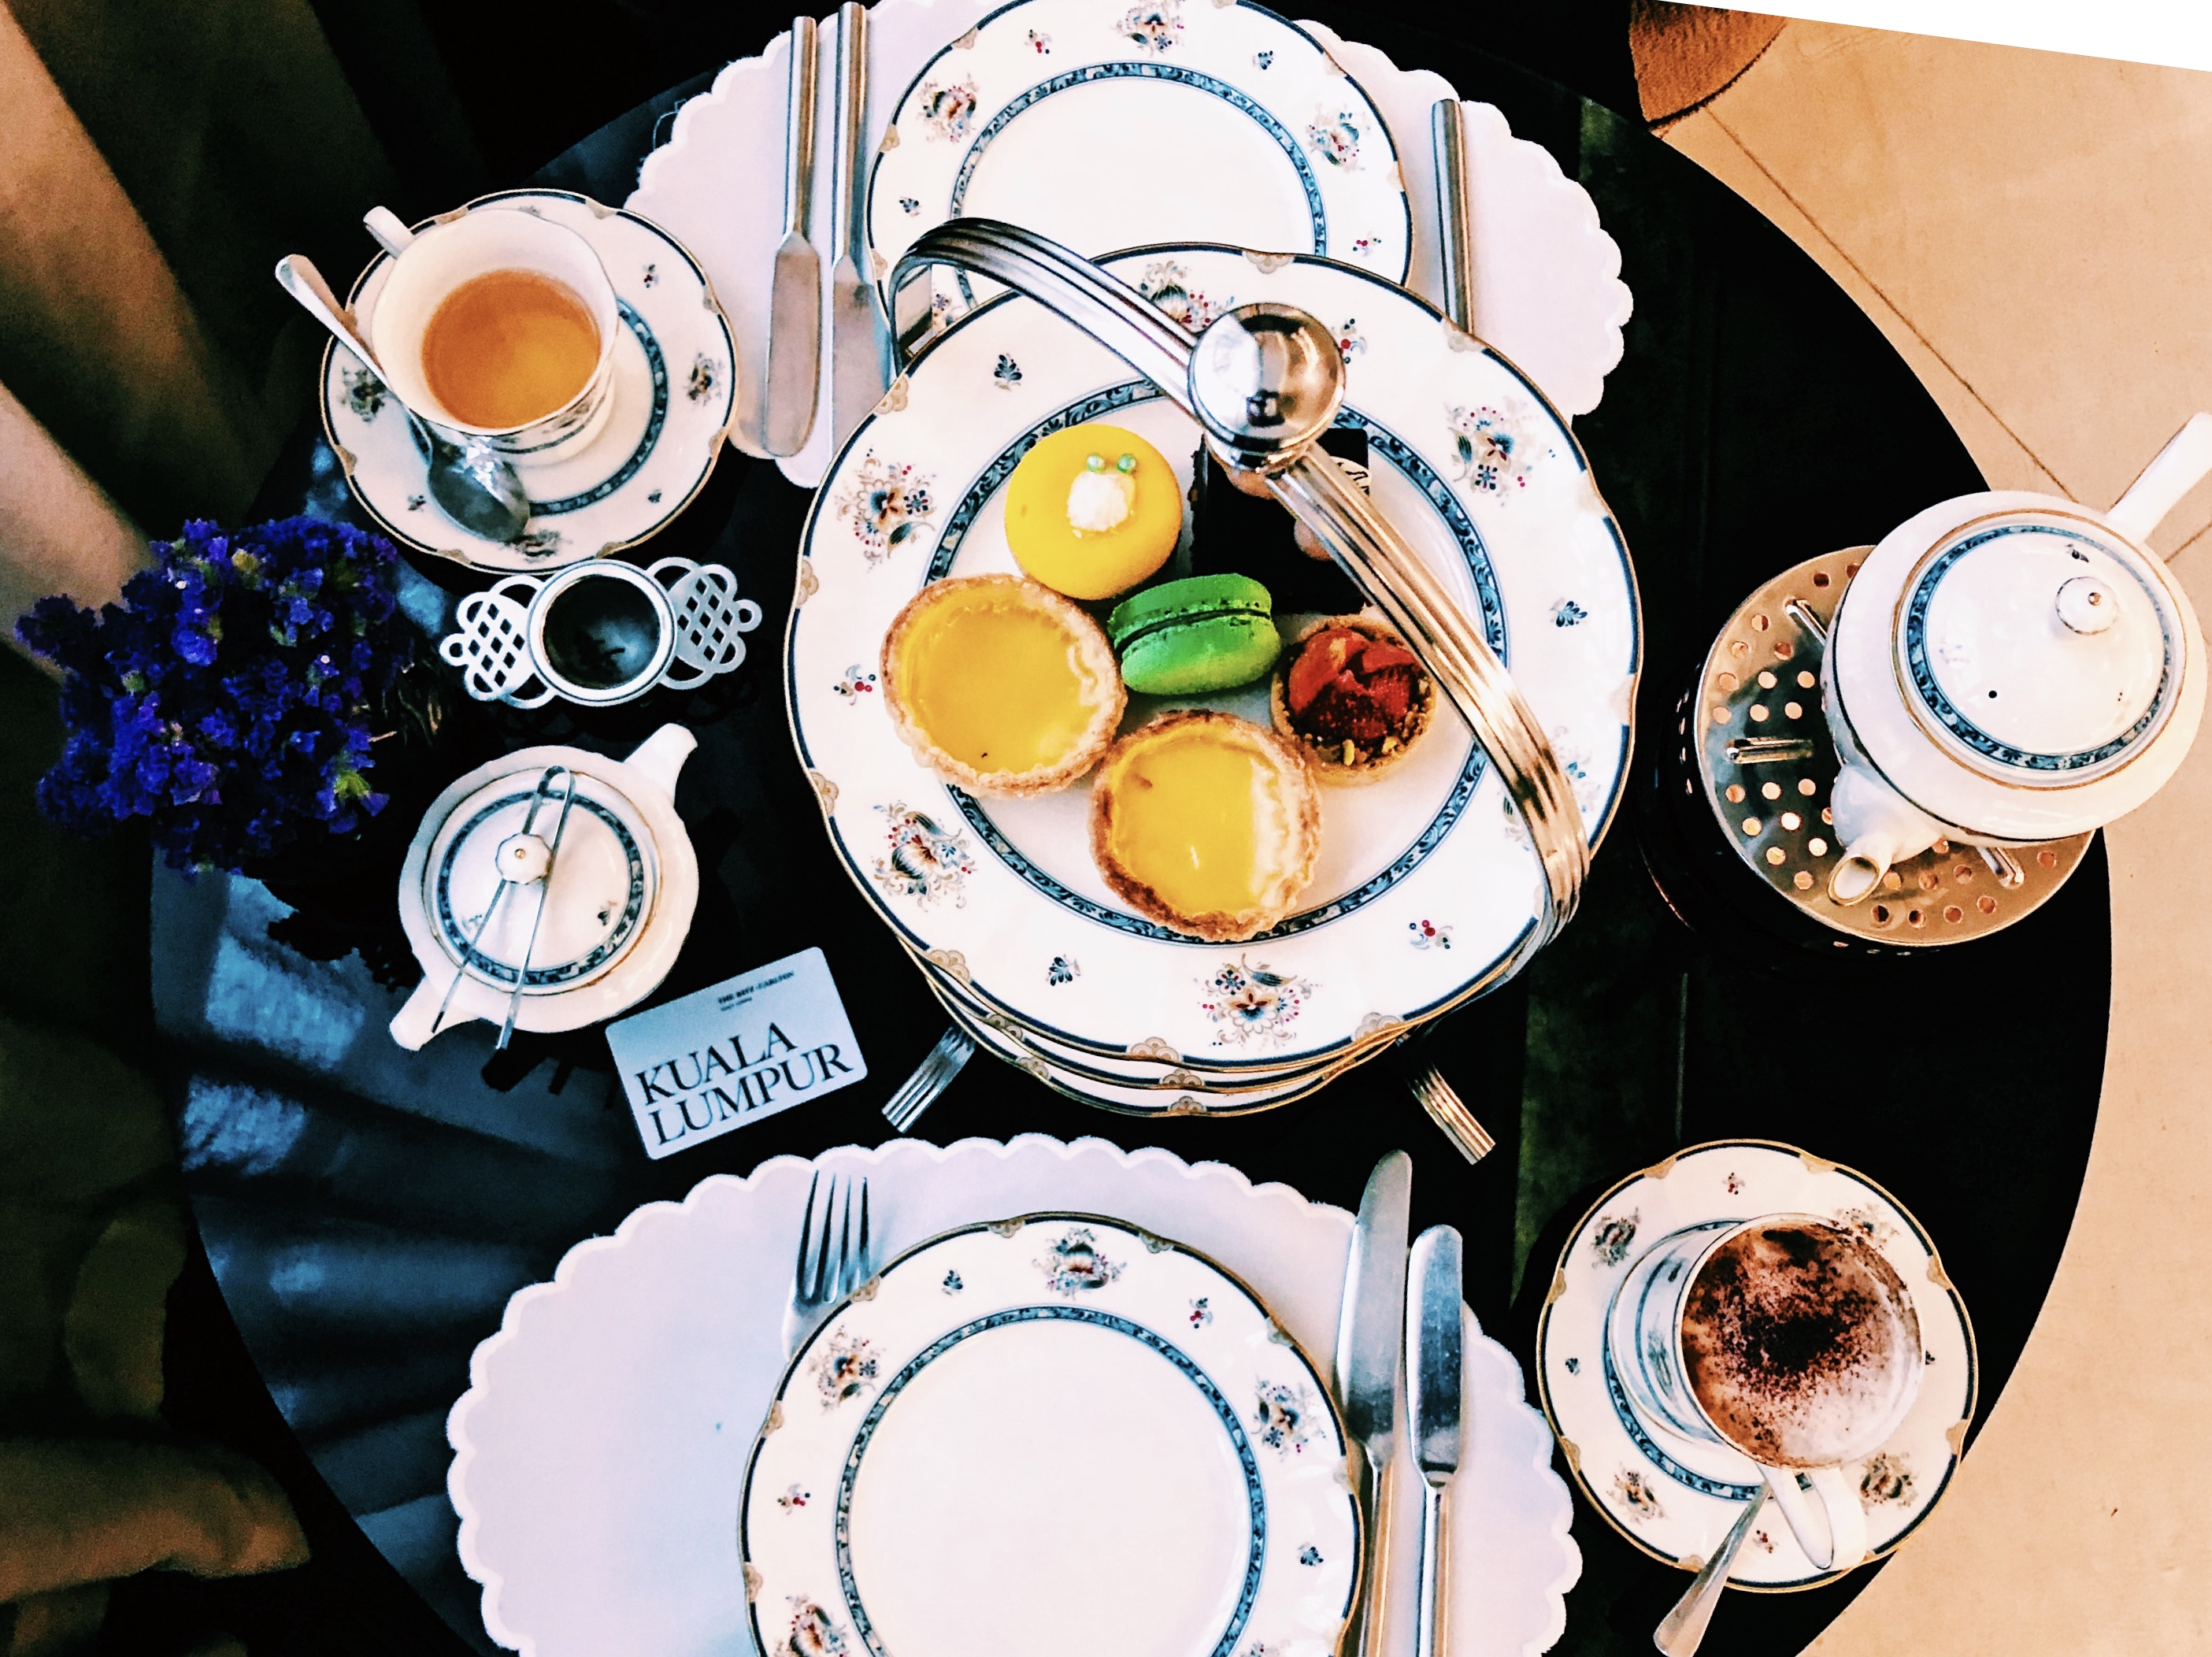 The Ritz-Carlton Kuala Lumpur Afternoon Tea